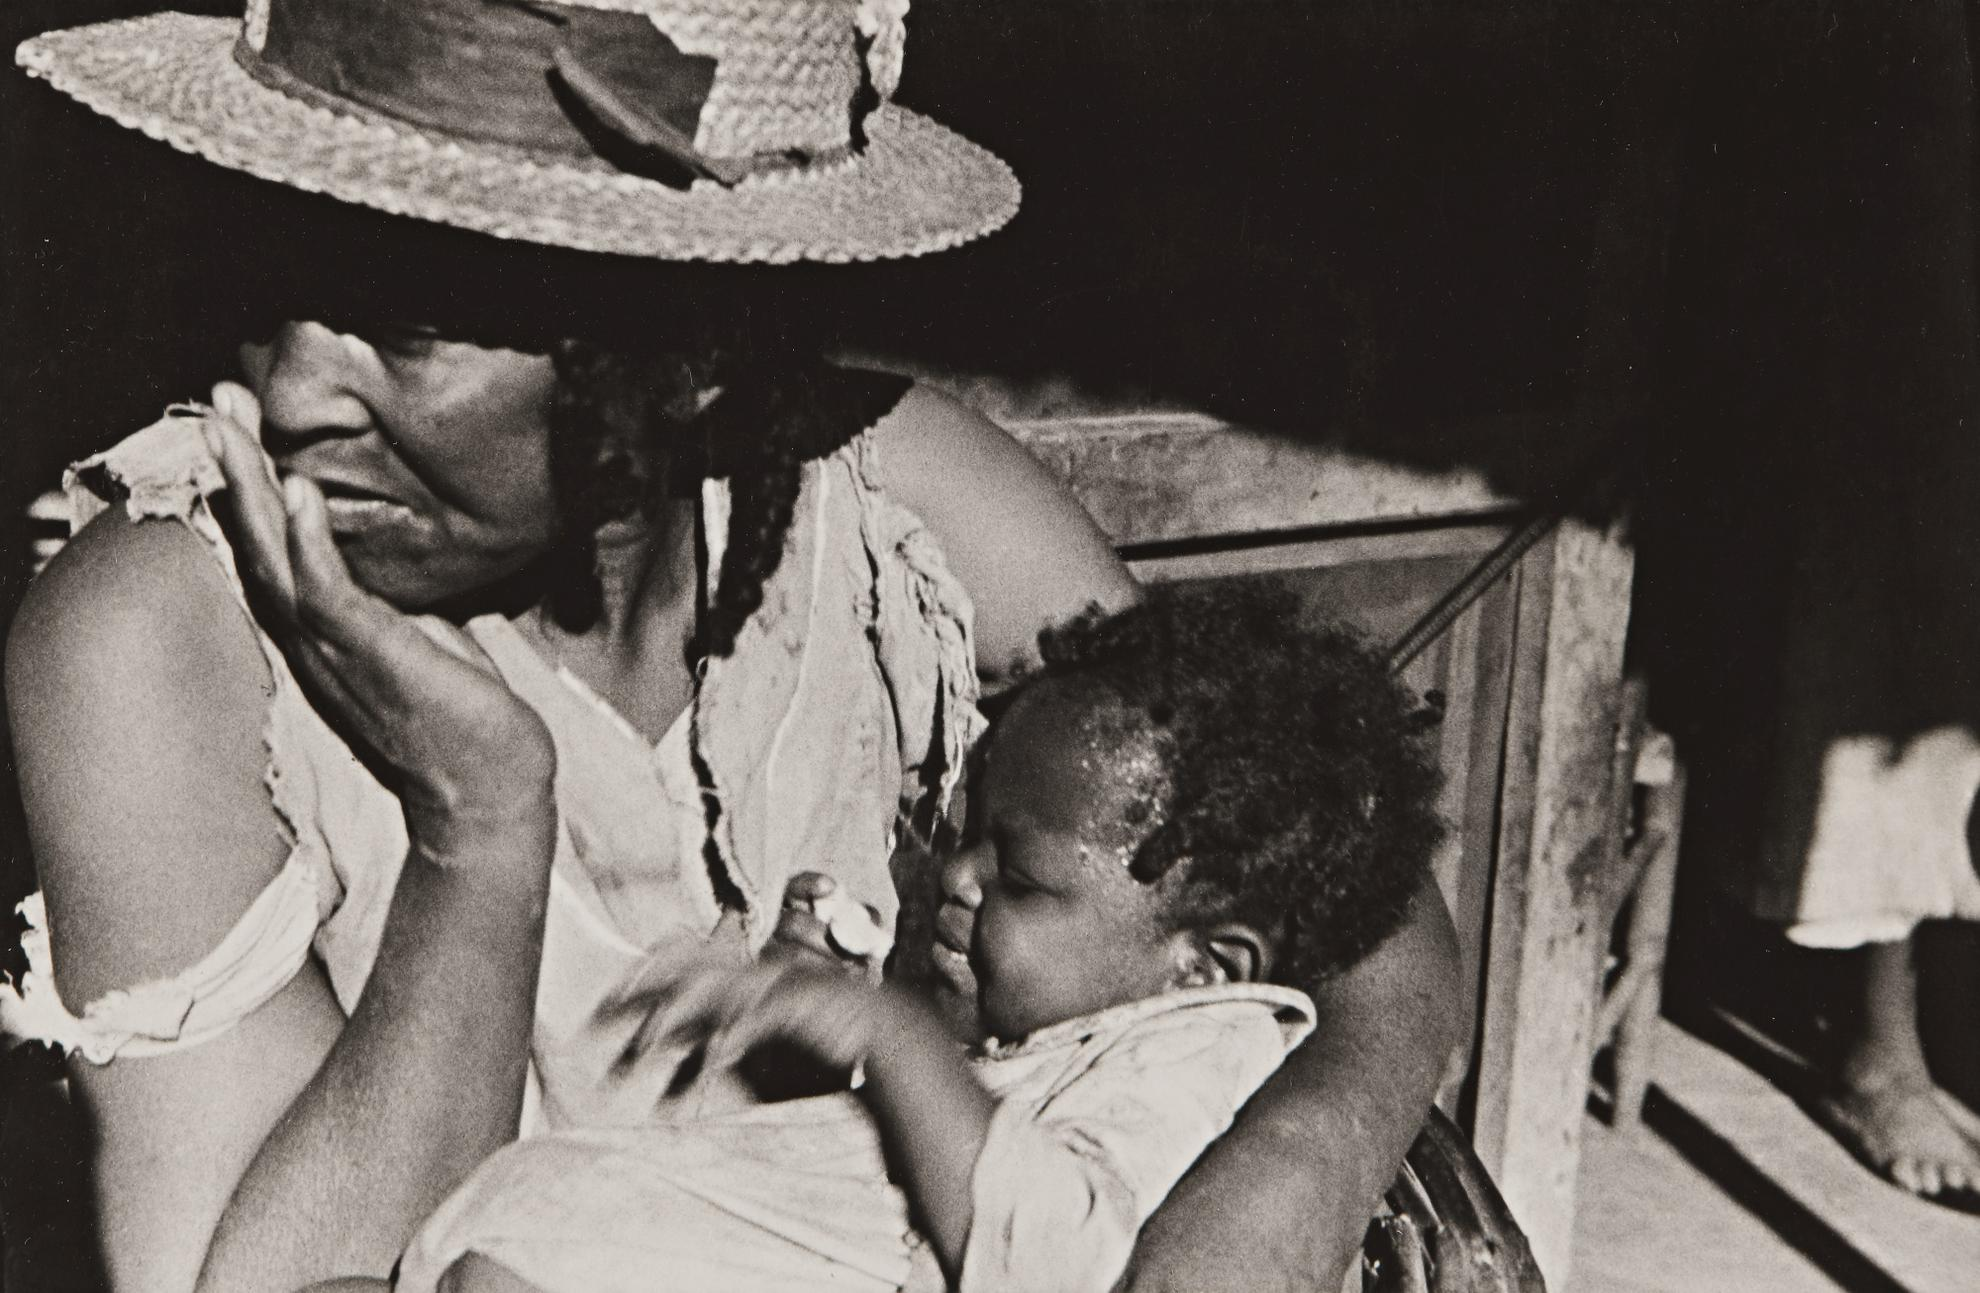 Ben Shahn-Family Of Negro Sharecropper, Little Rock, Arkansas-1935